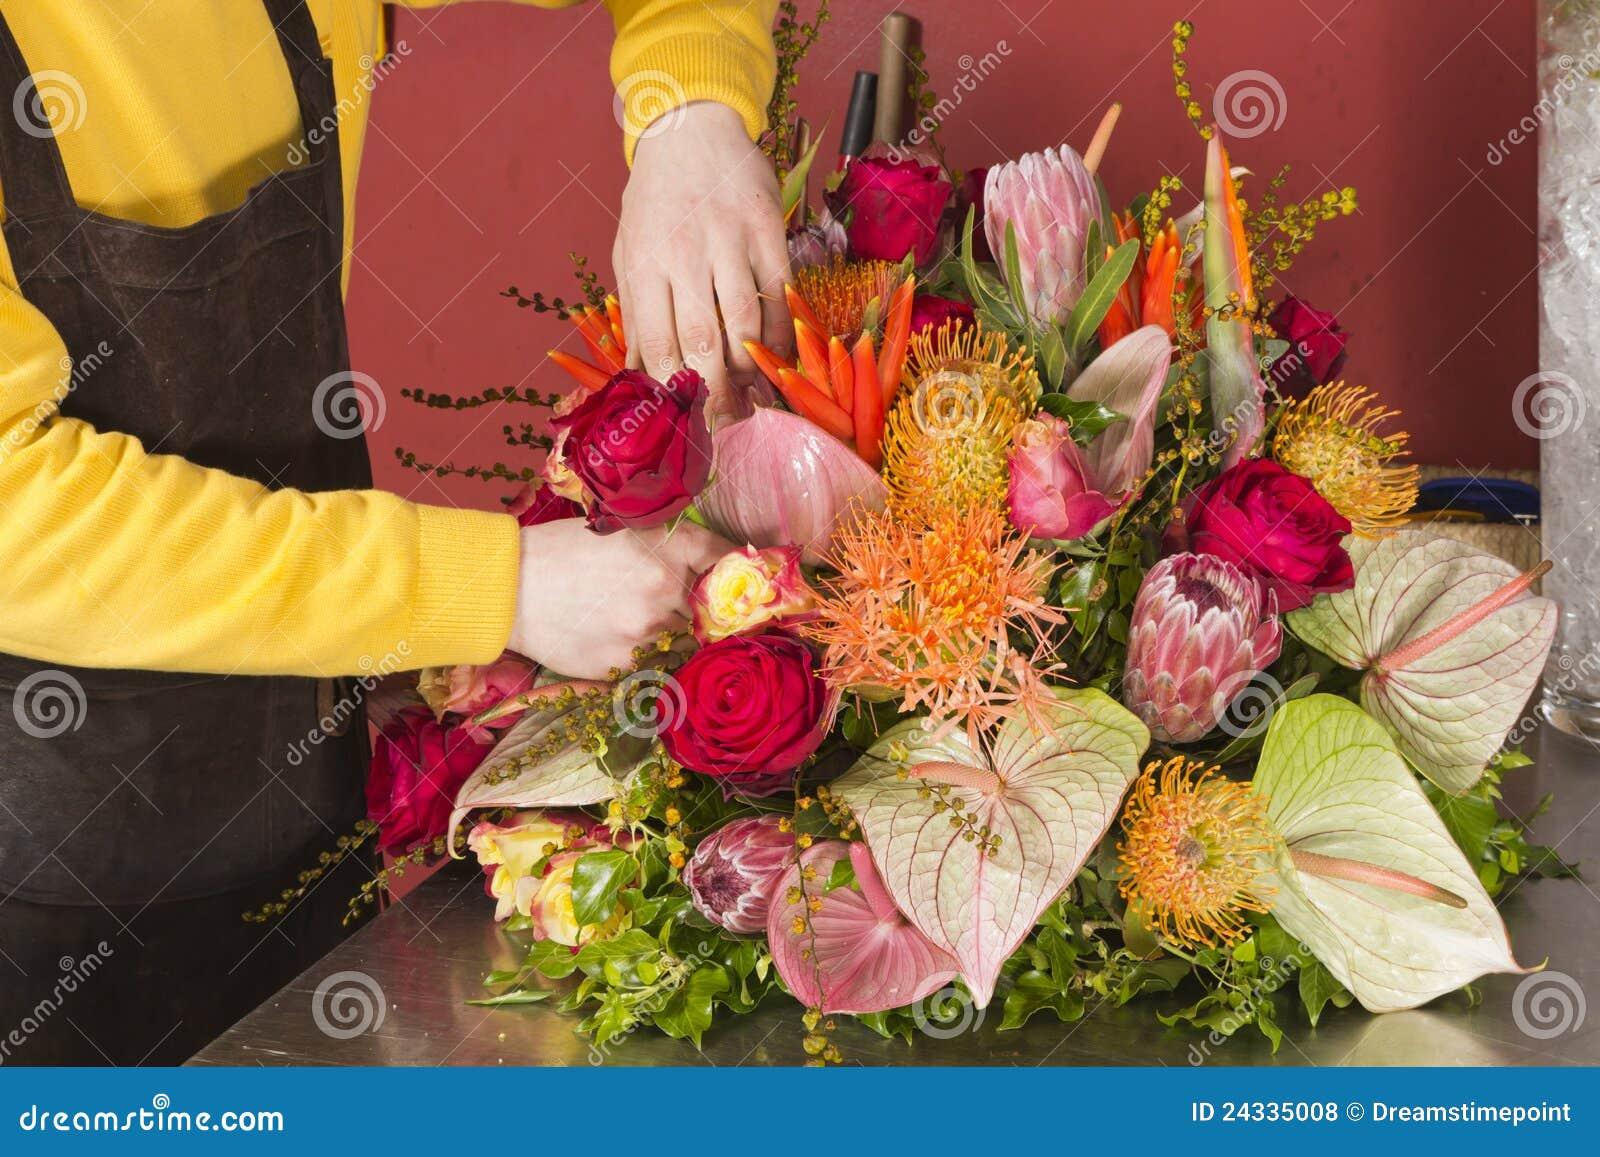 Skillful florist arranging rich flower bouquet